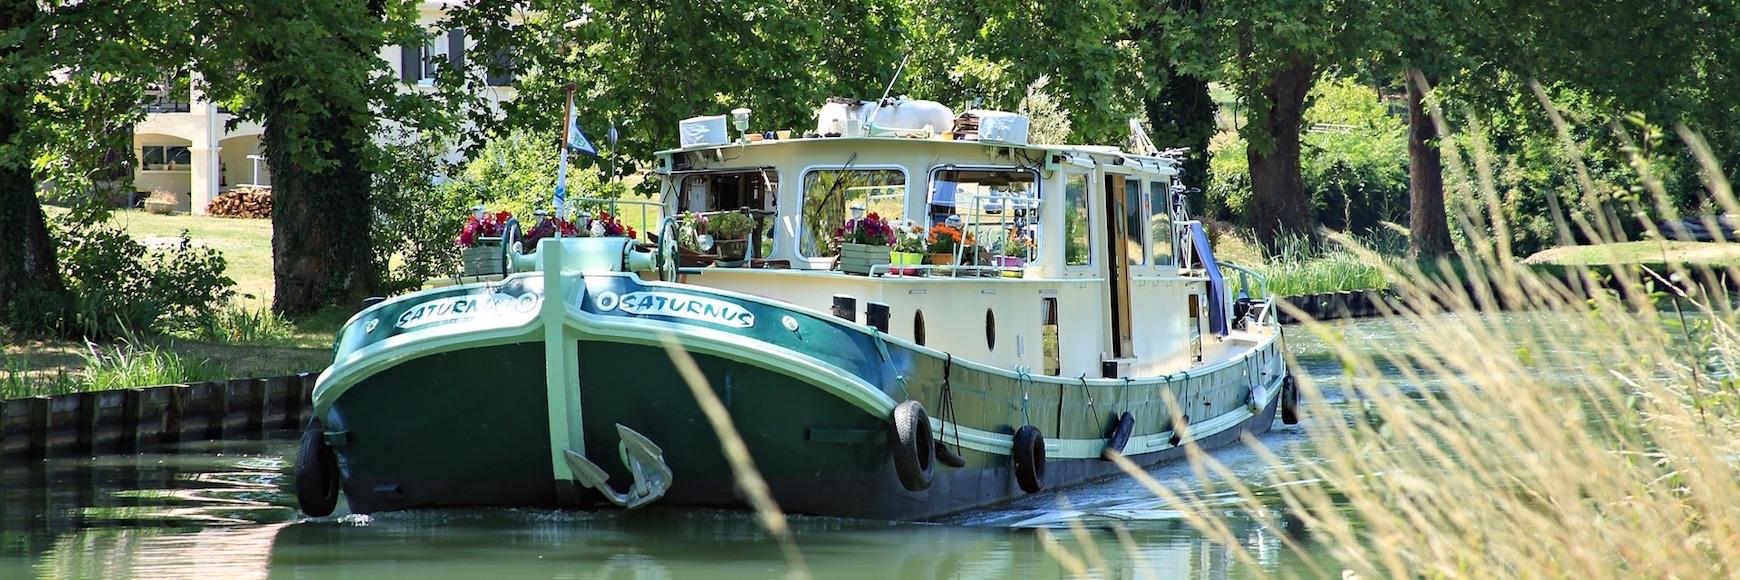 Location catamaran France